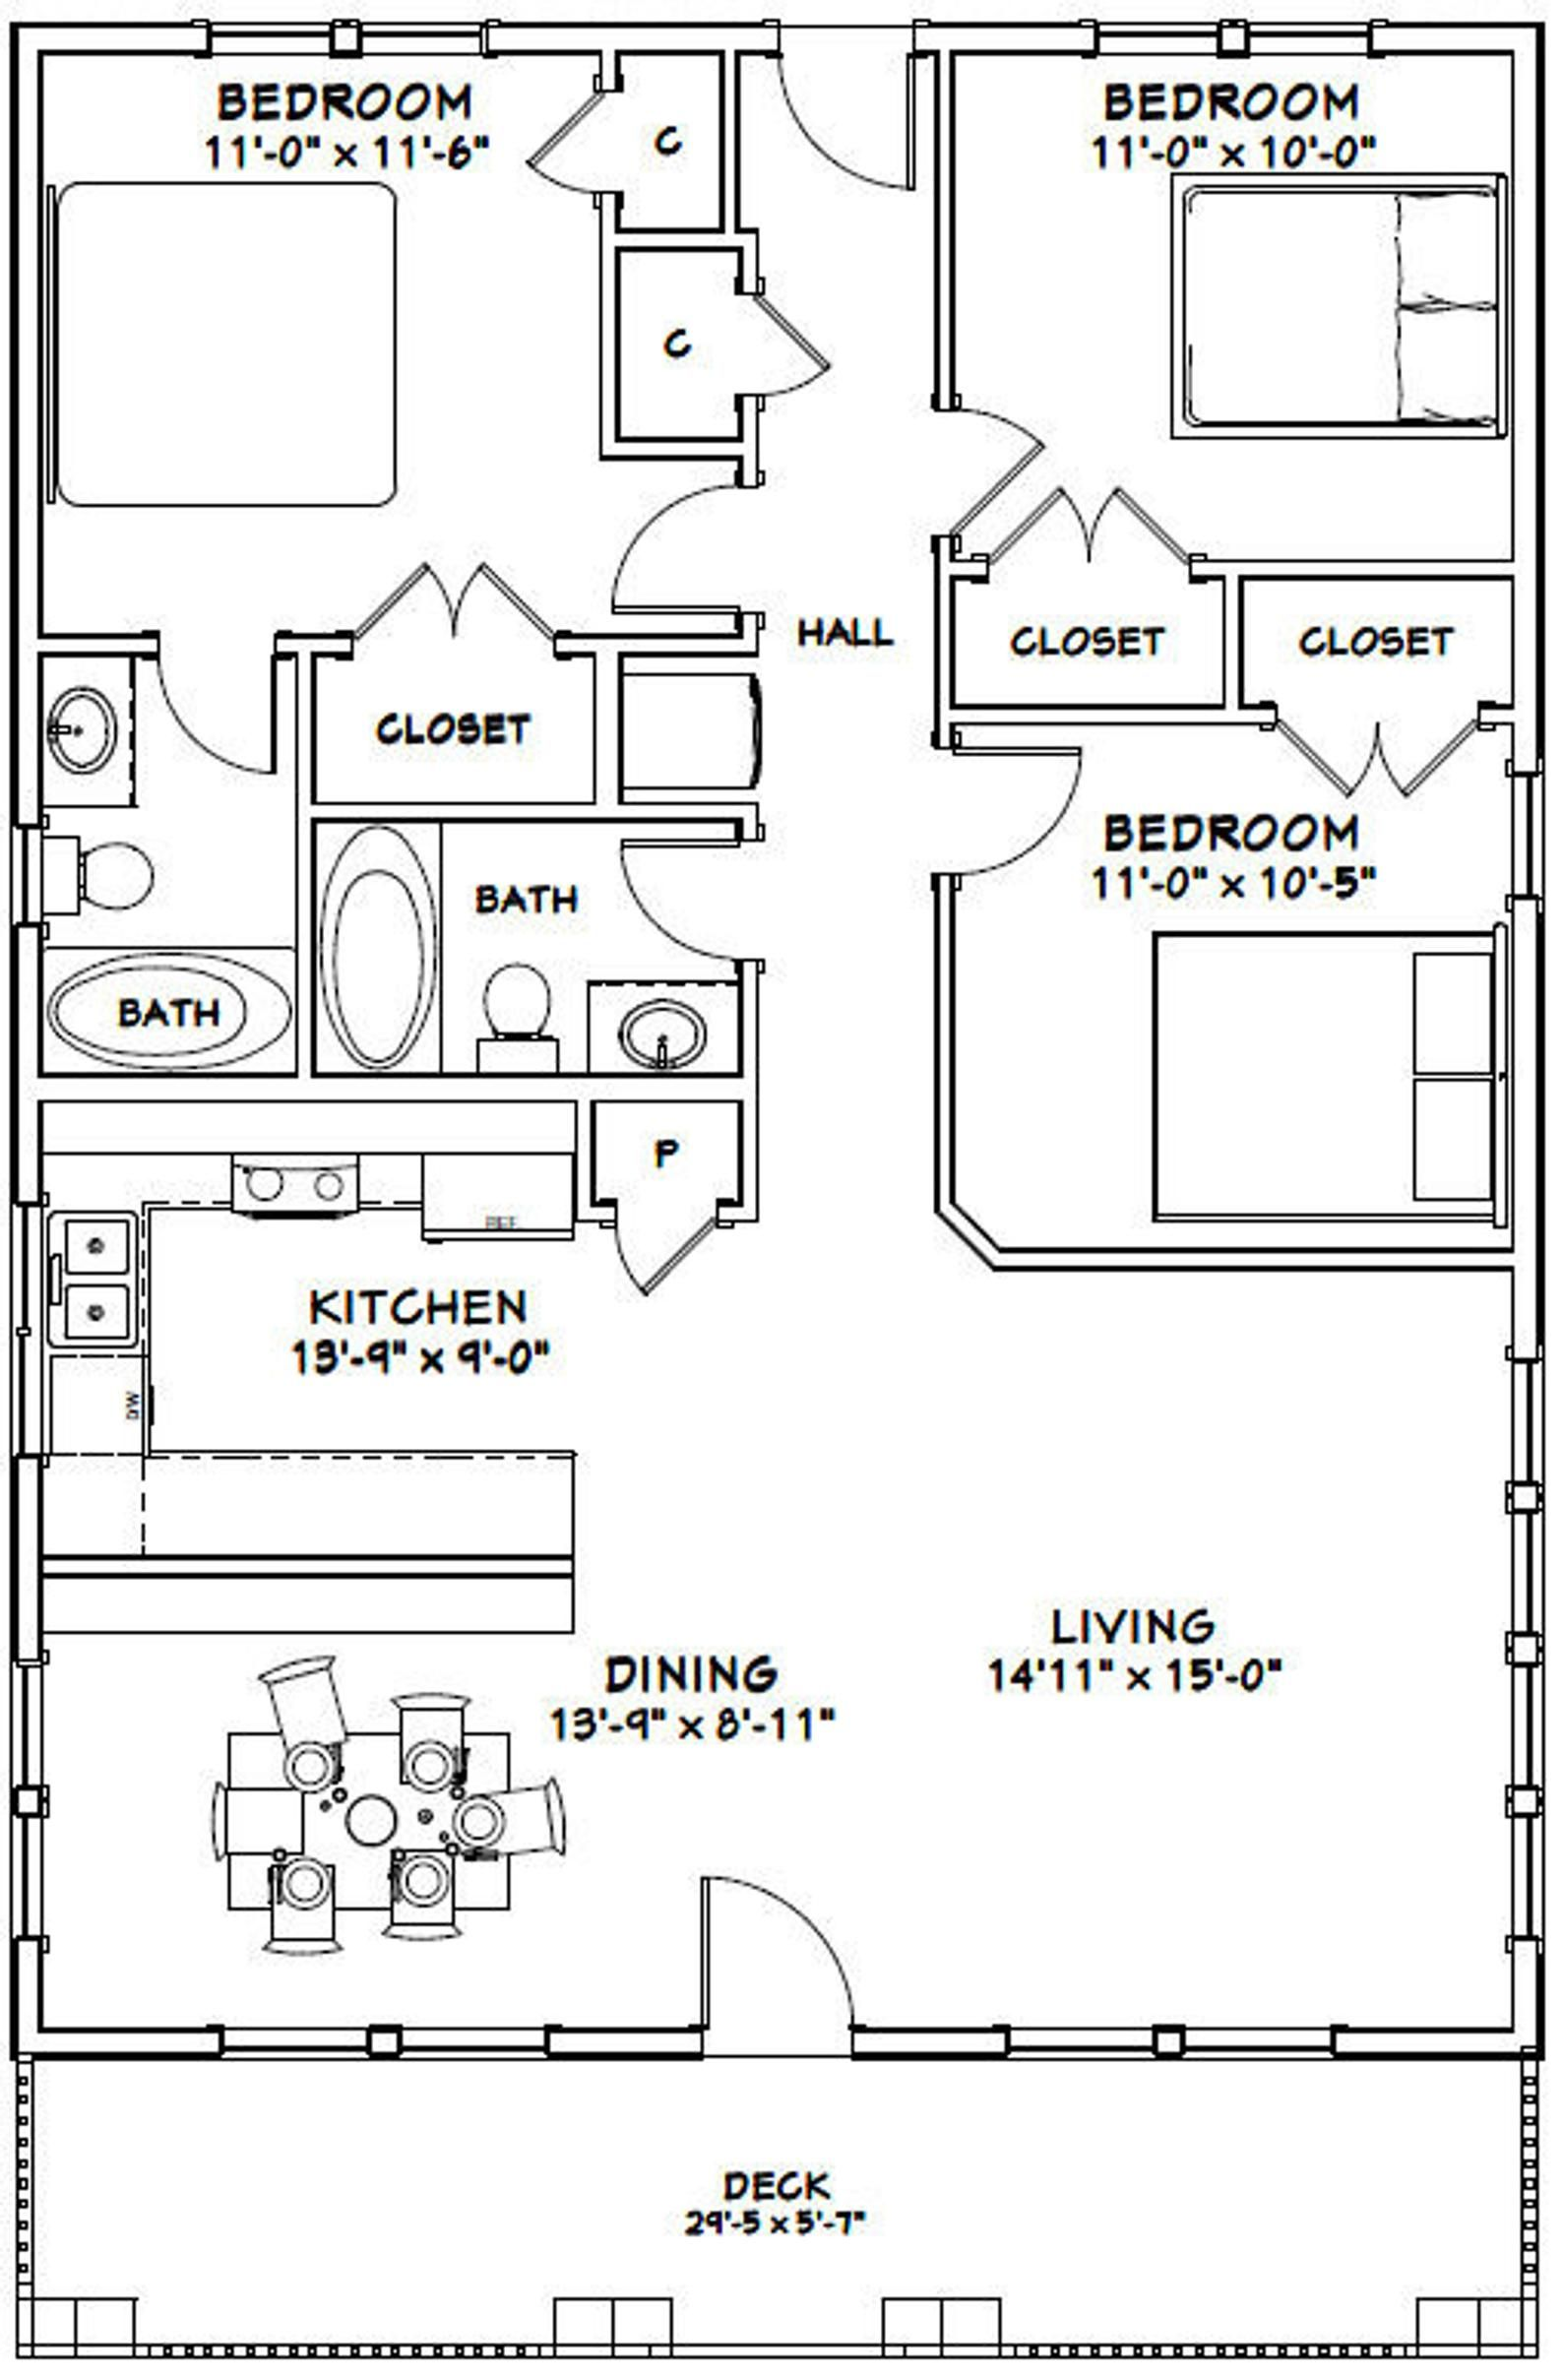 30x40 House 3-Bedroom 2-Bath 1200 sq ft PDF Floor | Etsy ...